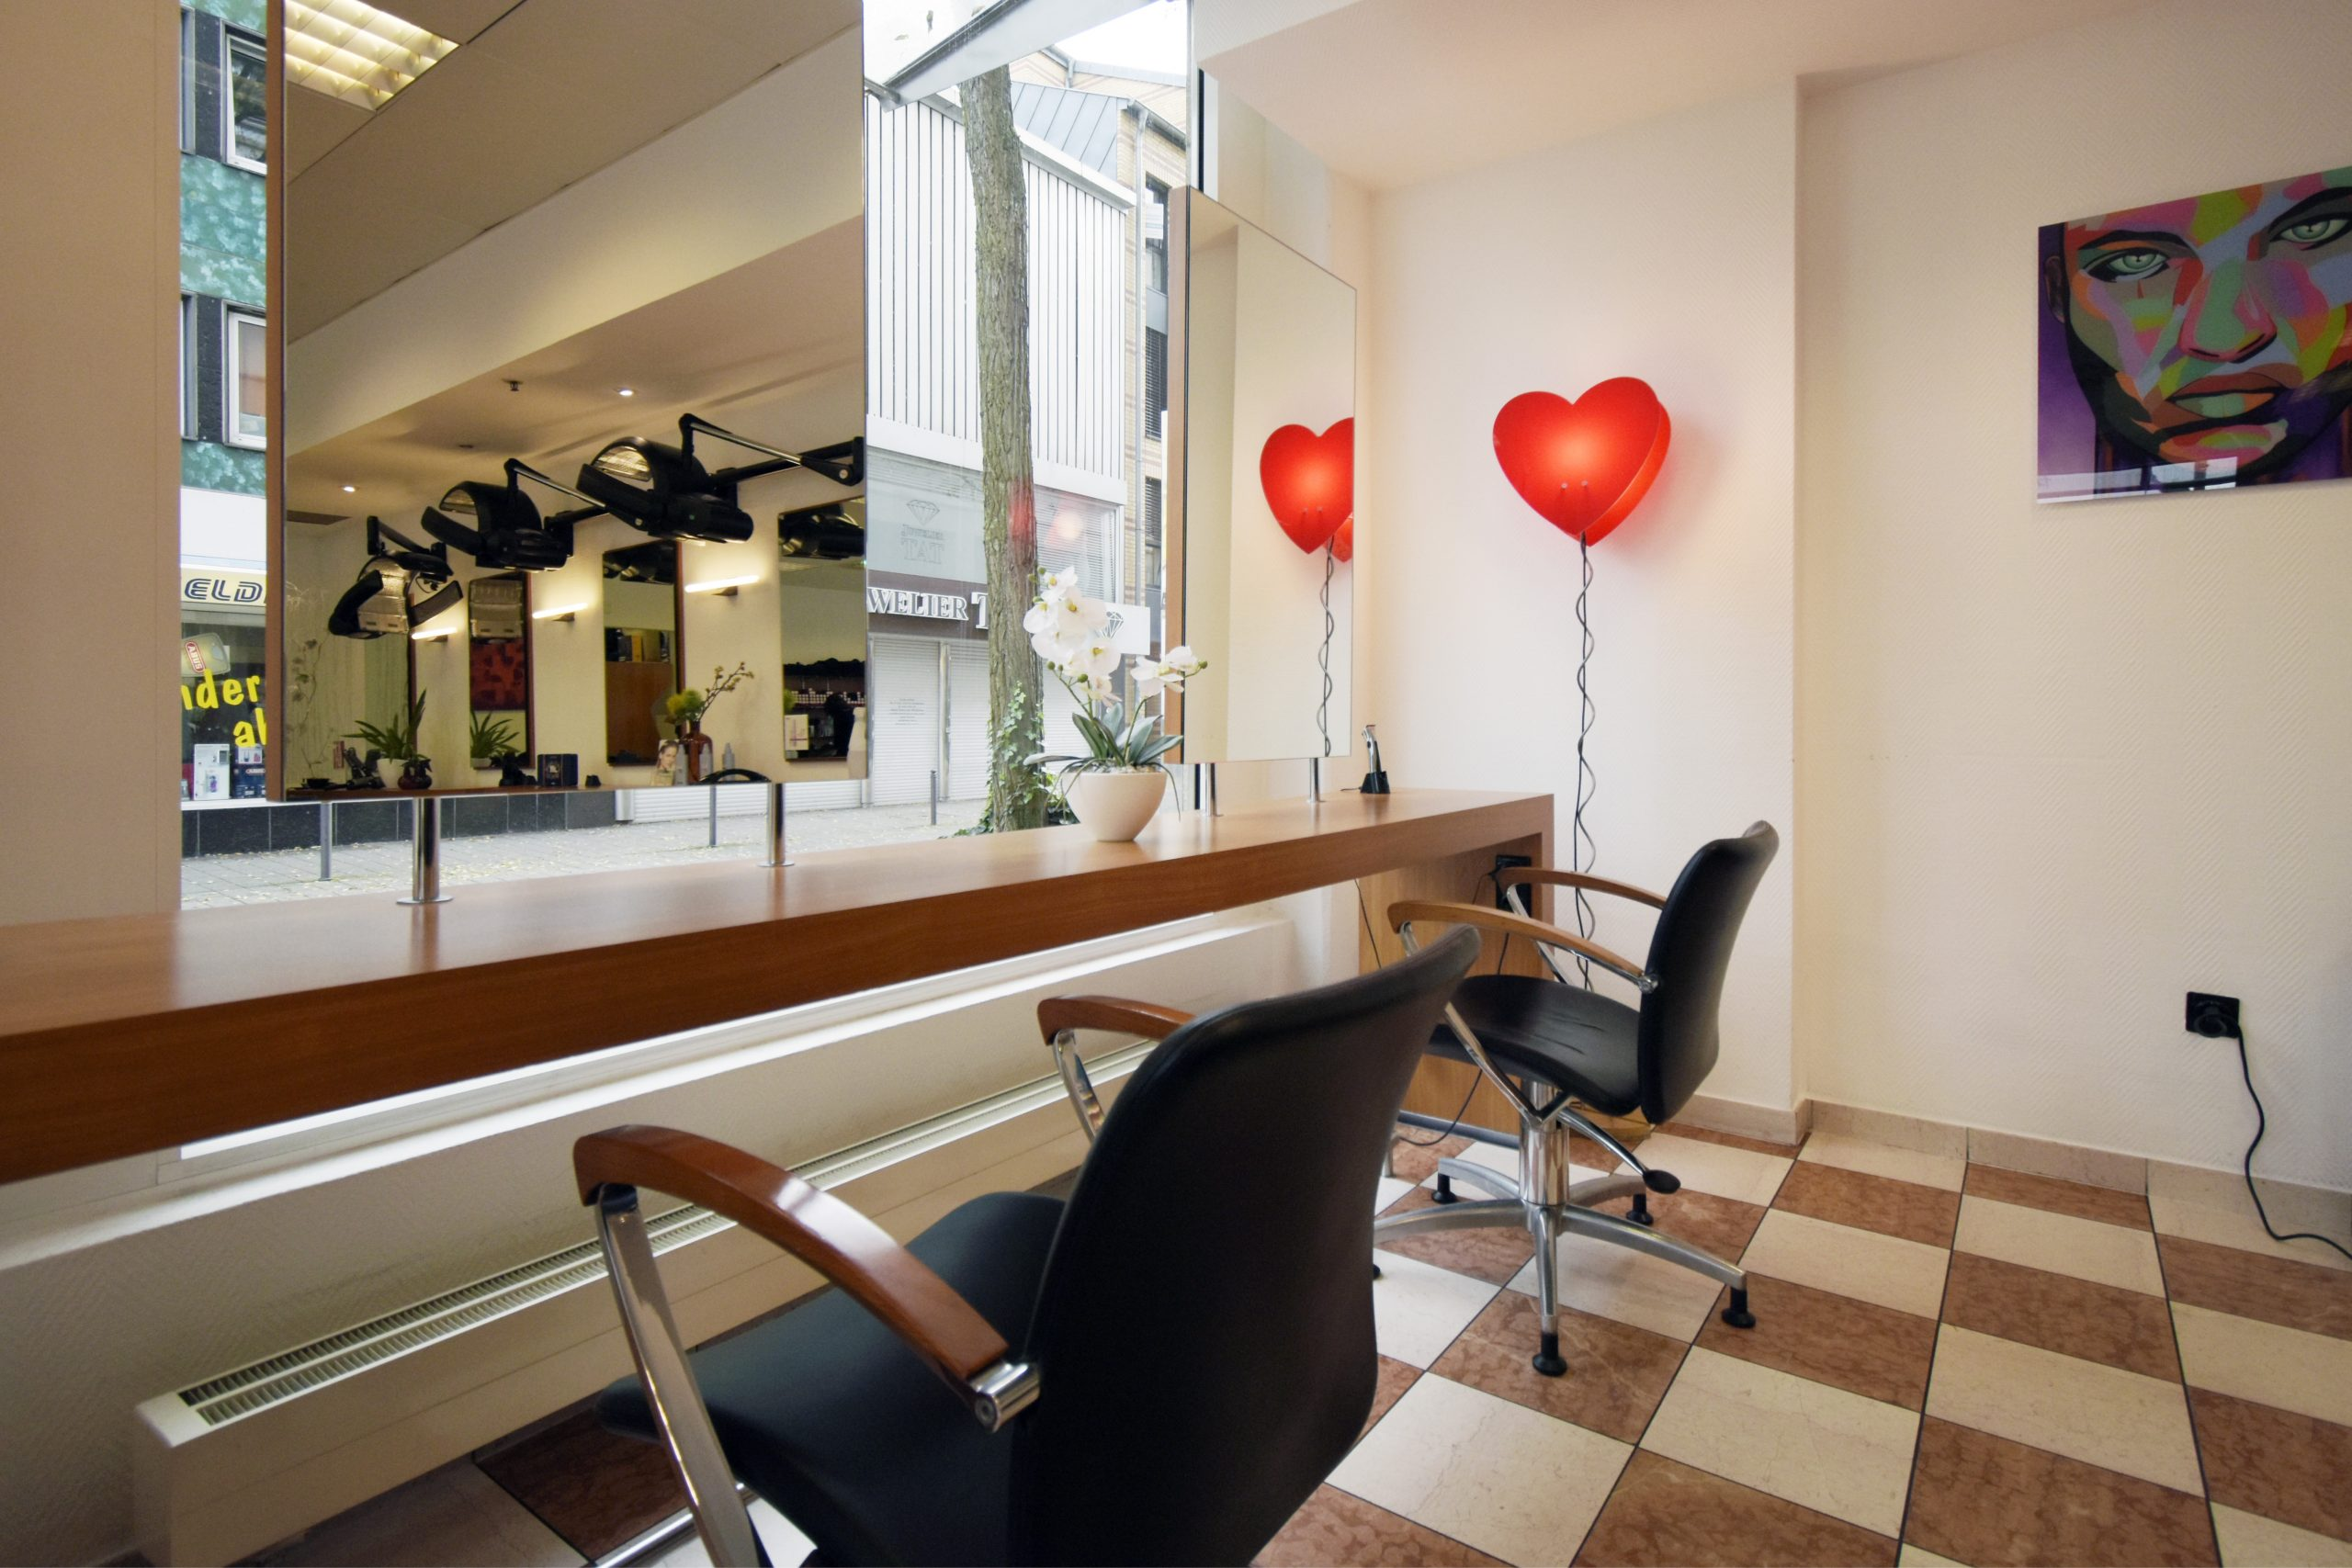 Einkaufszentrum Wuppertal JP Haircompany